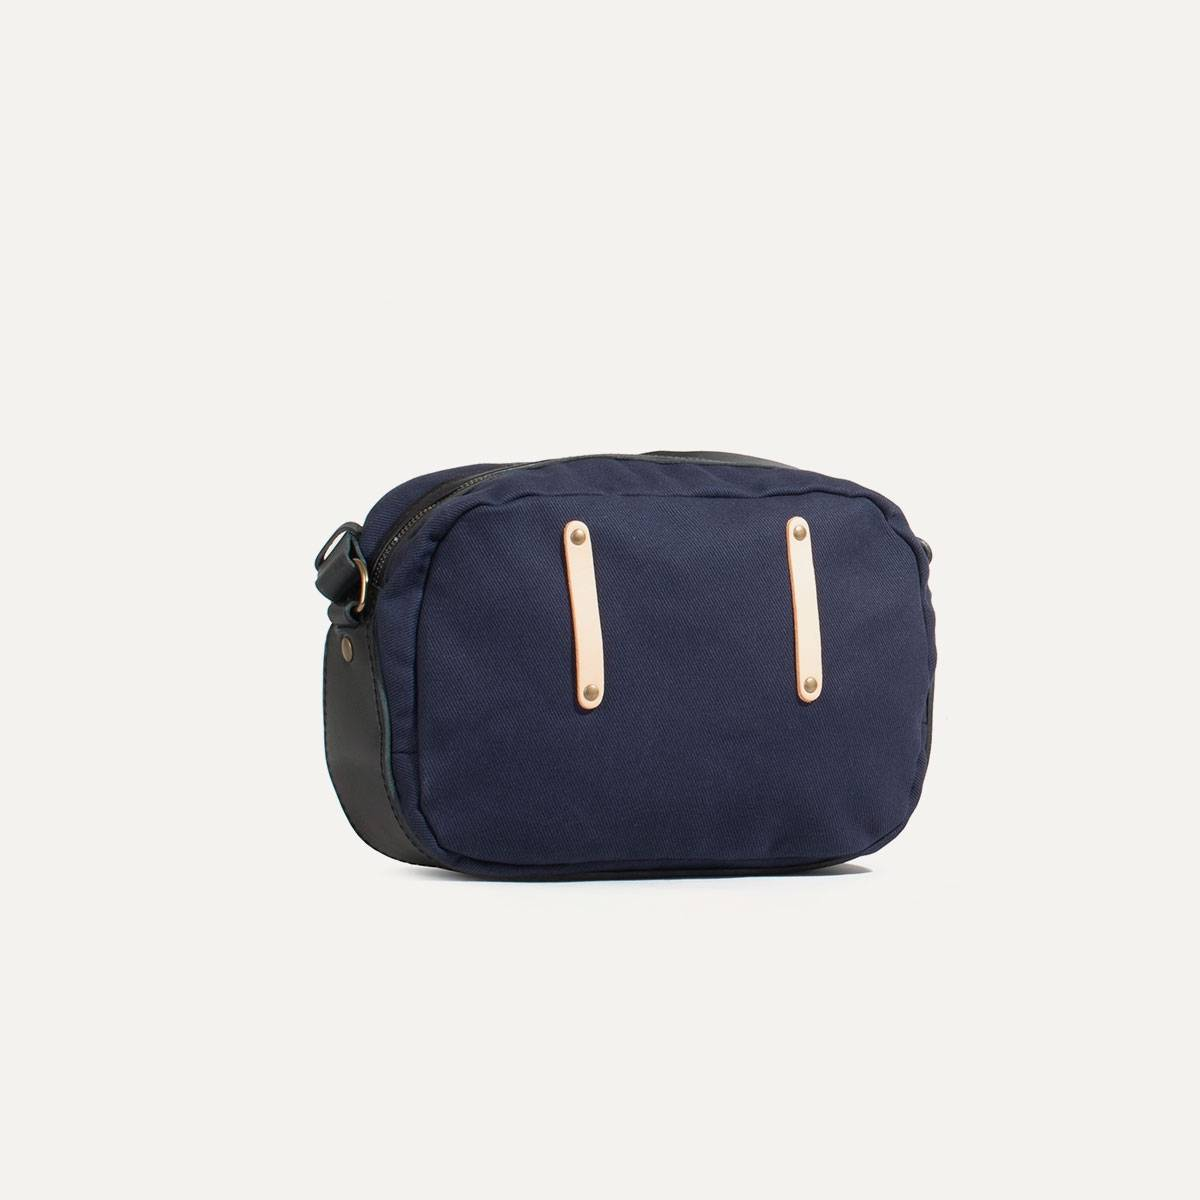 Honshu Belt bag - Navy / Black (image n°5)